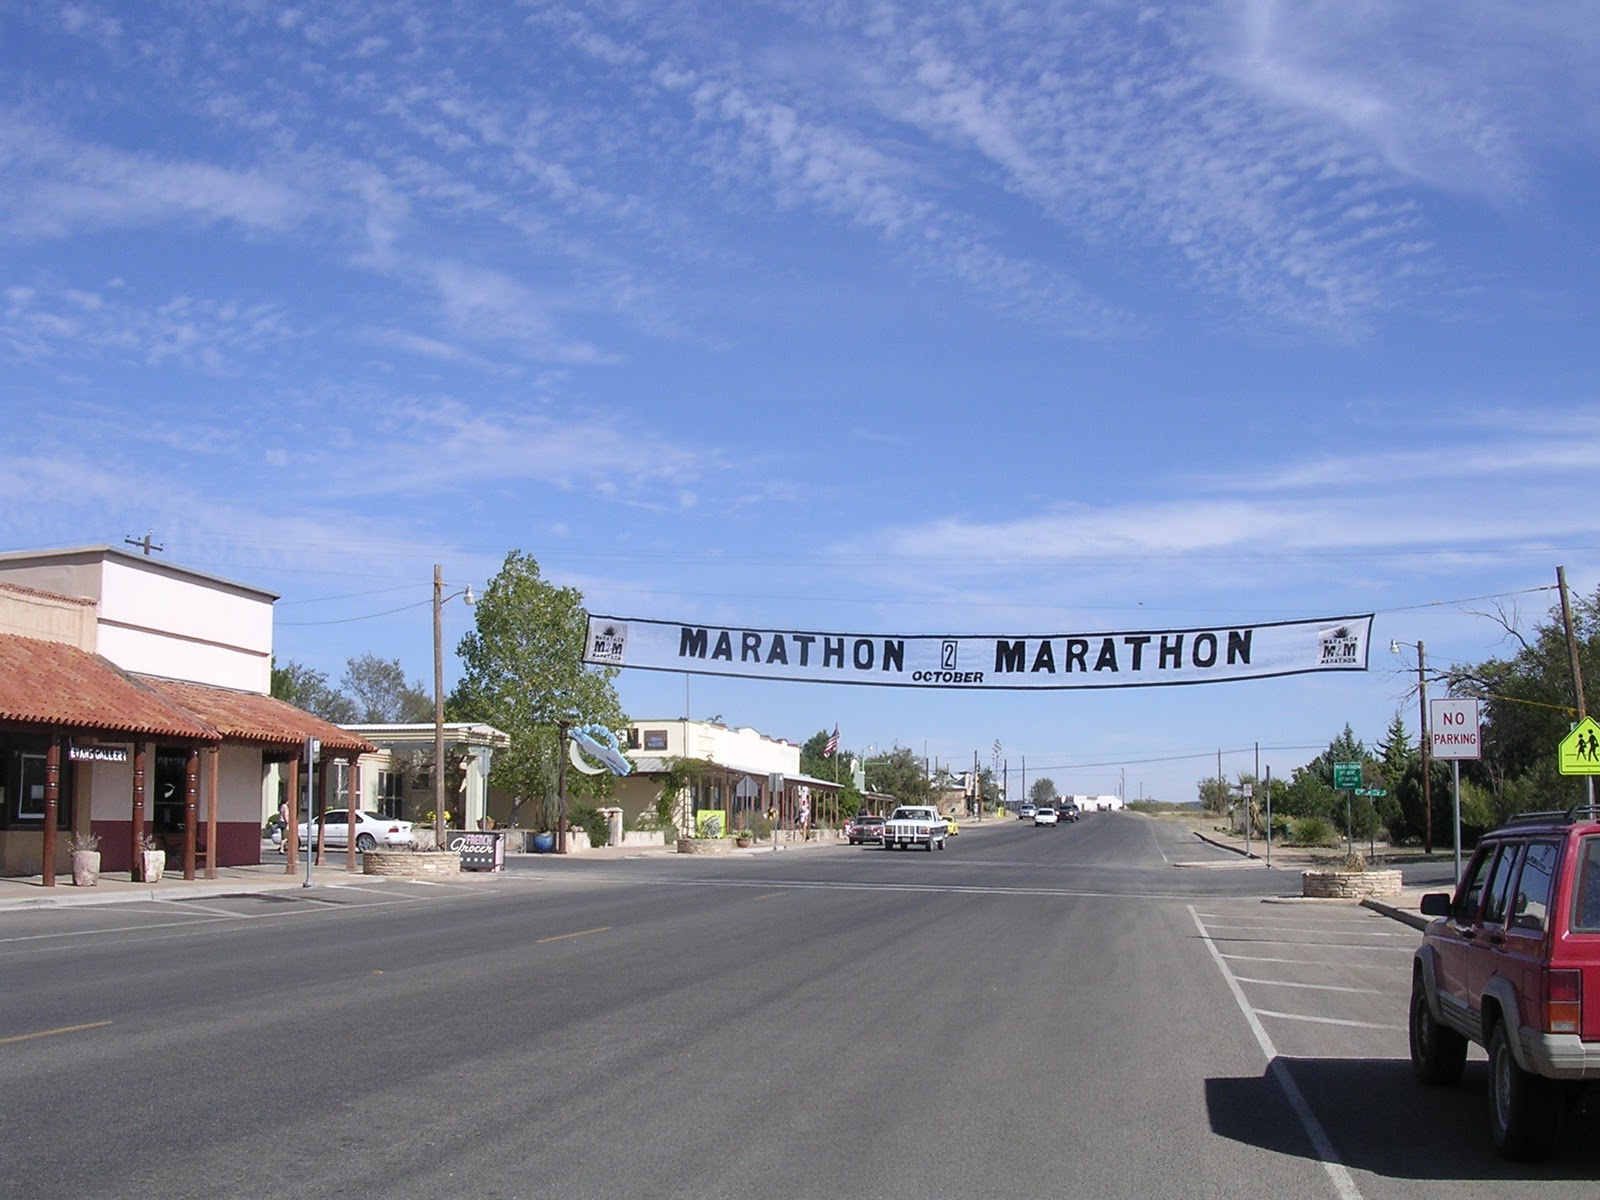 Testerman Travels: Van Horn, TX to Marathon, TX Oct 15marathon town